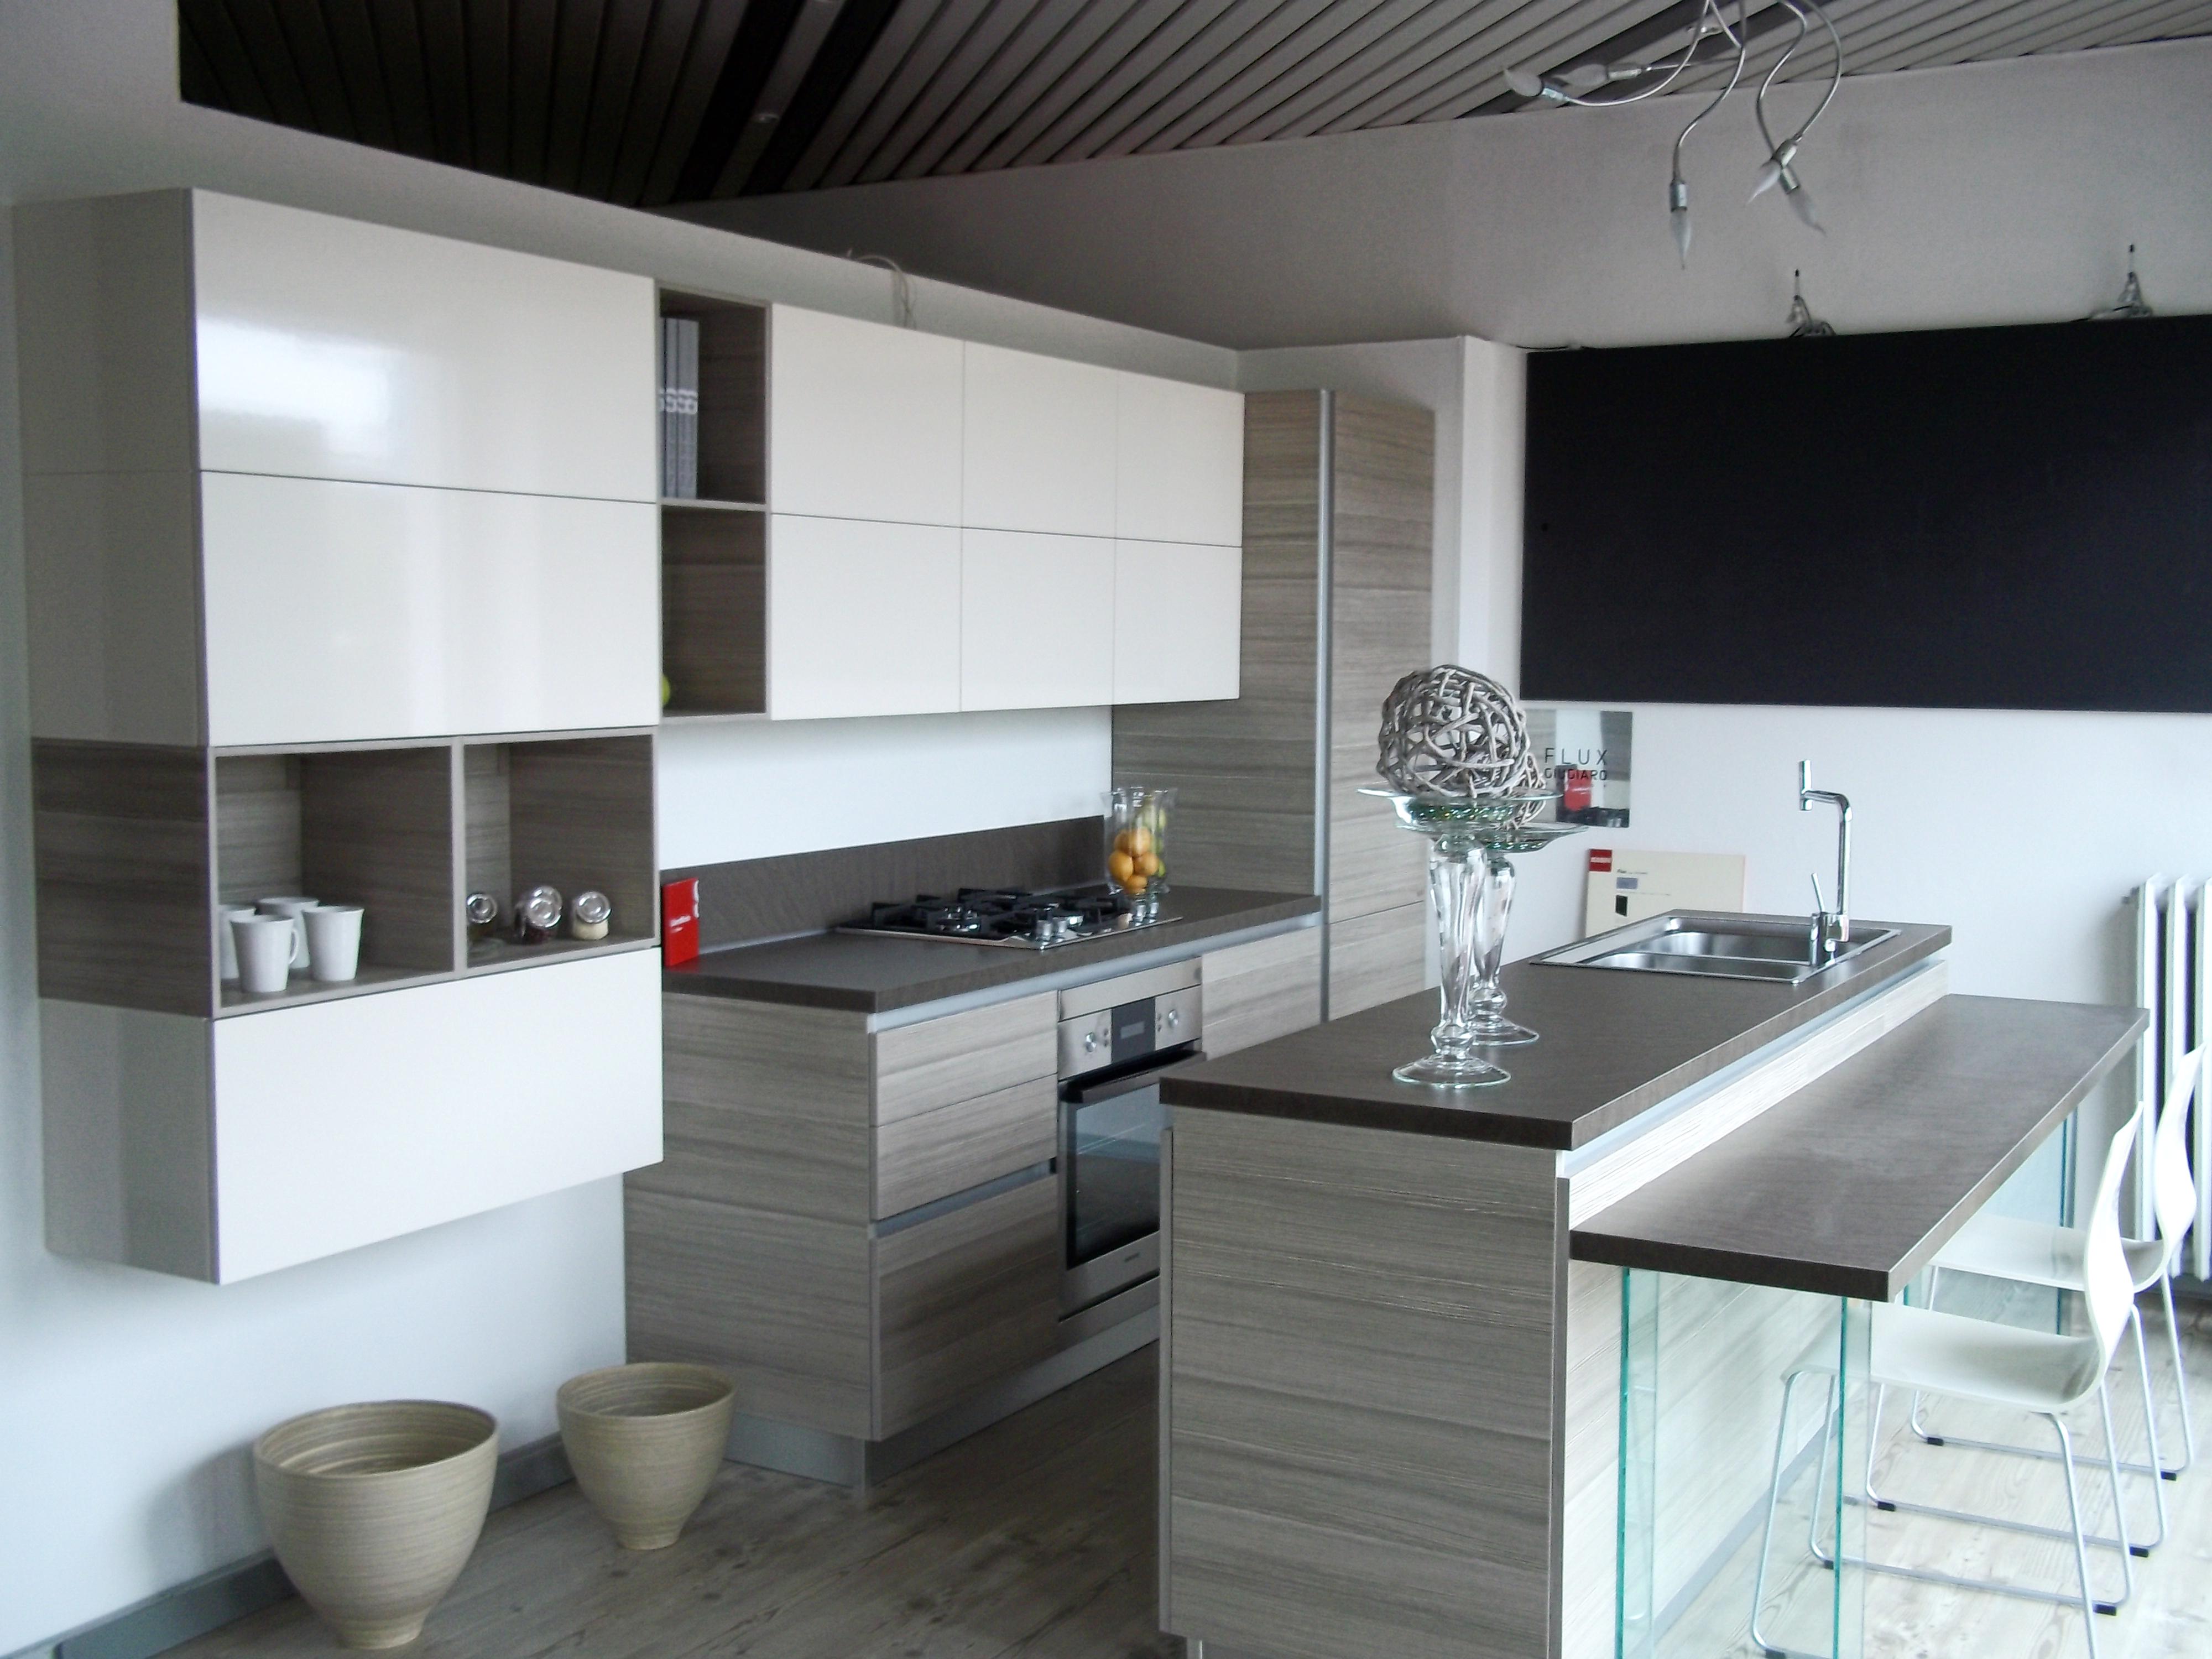 Awesome Cucine Moderne Prezzi Contemporary - Design & Ideas 2017 ...